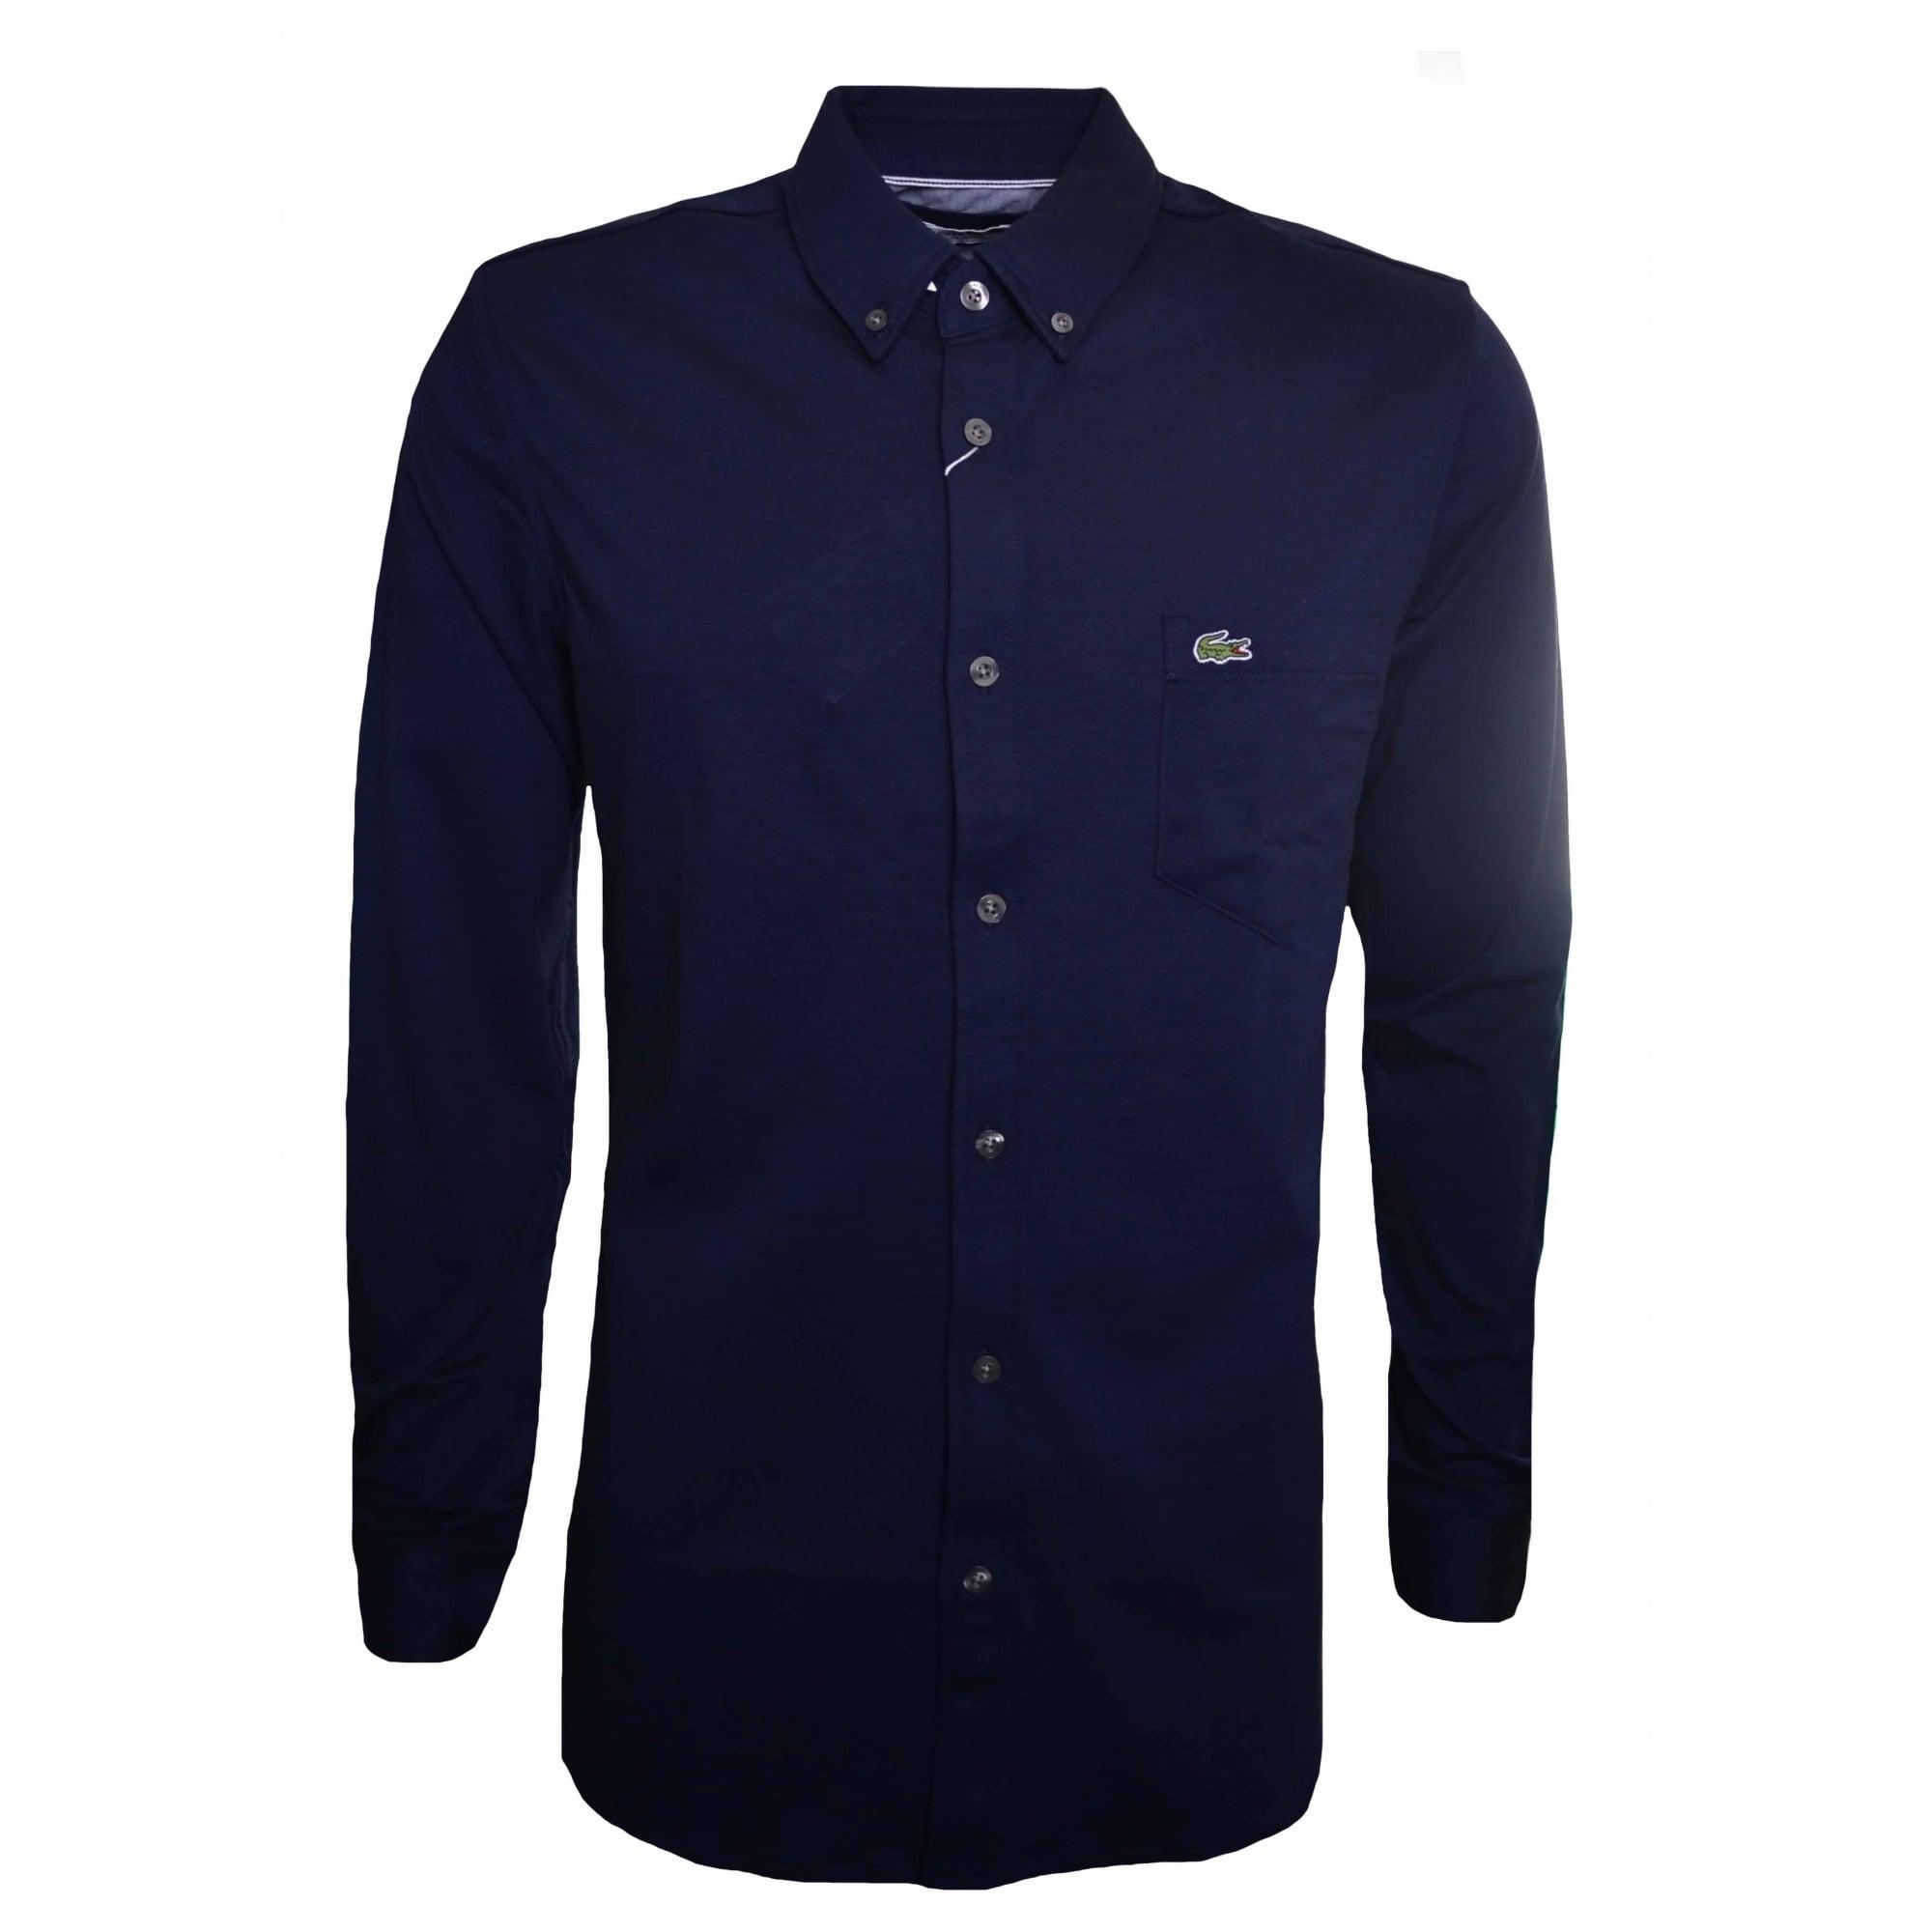 Navy // Blue Lacoste Mens Check Shirt